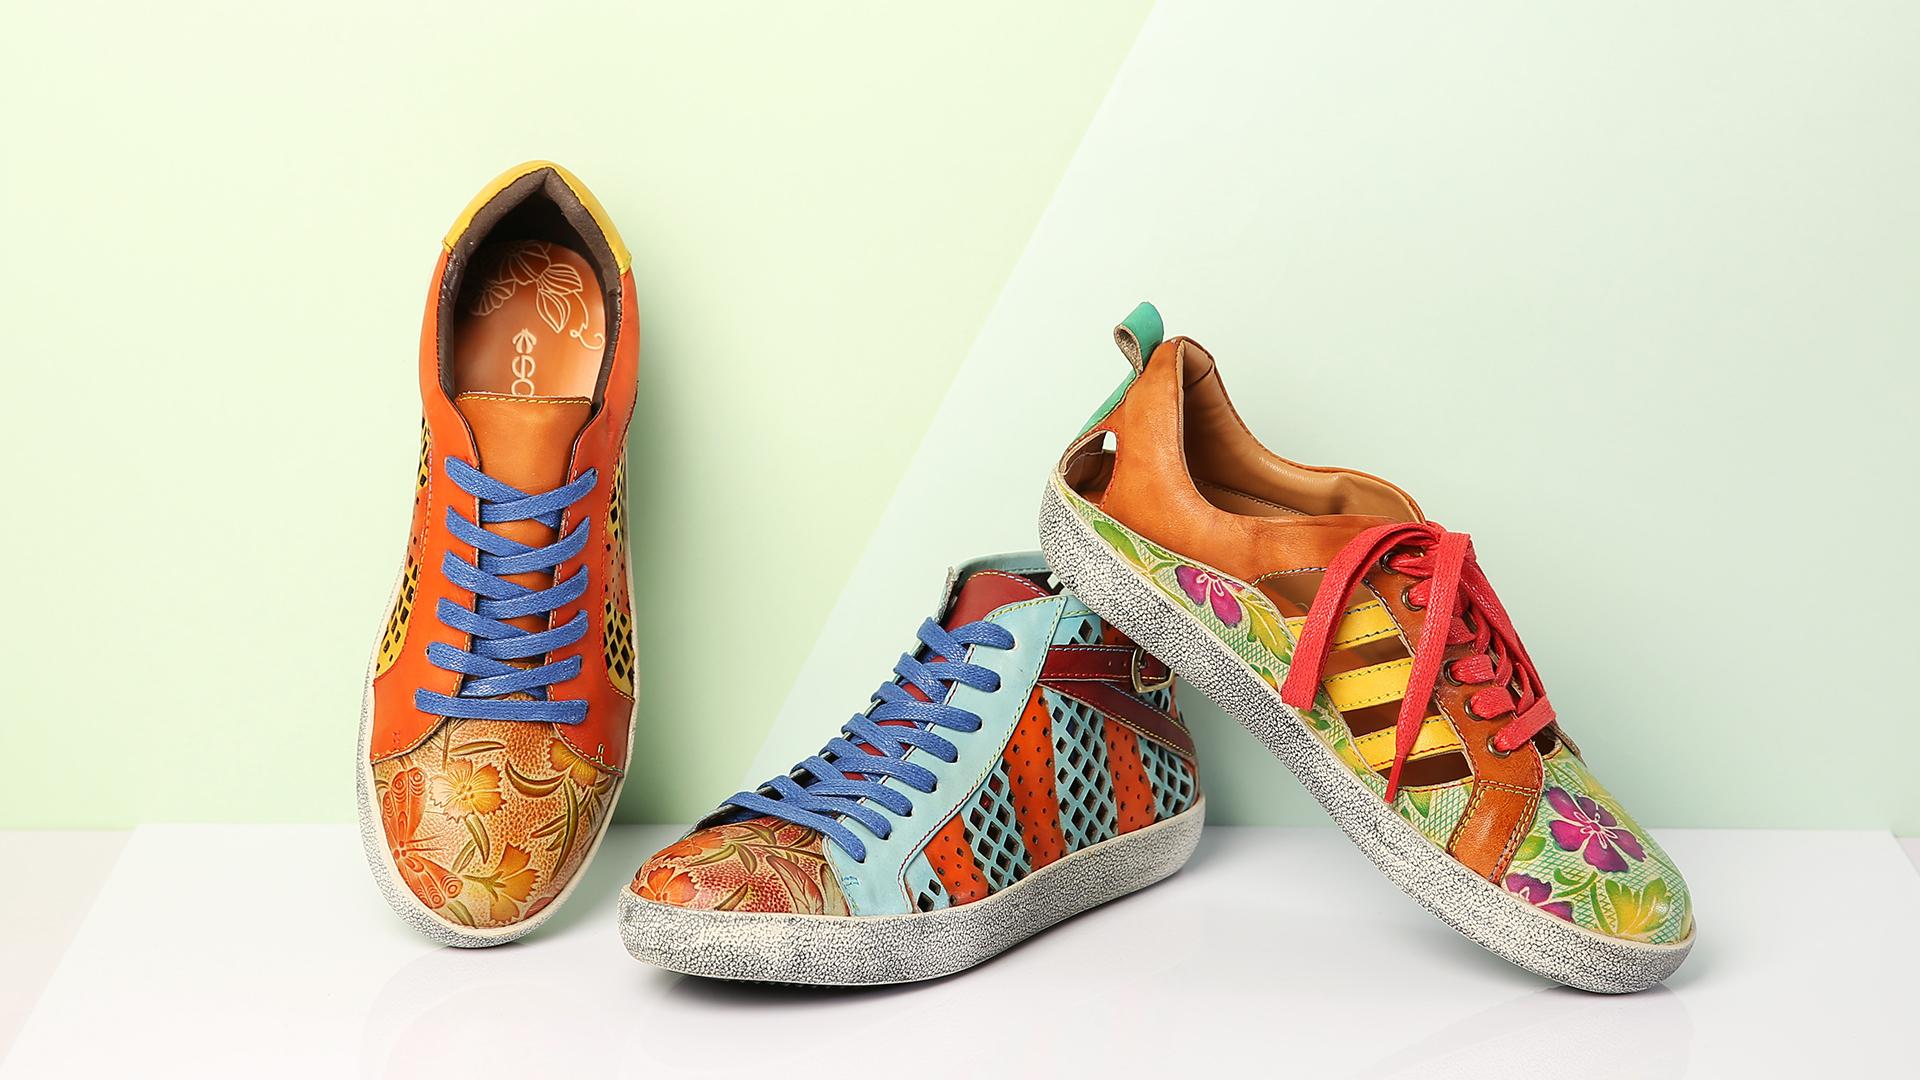 SOCOFY Retro Sneakers